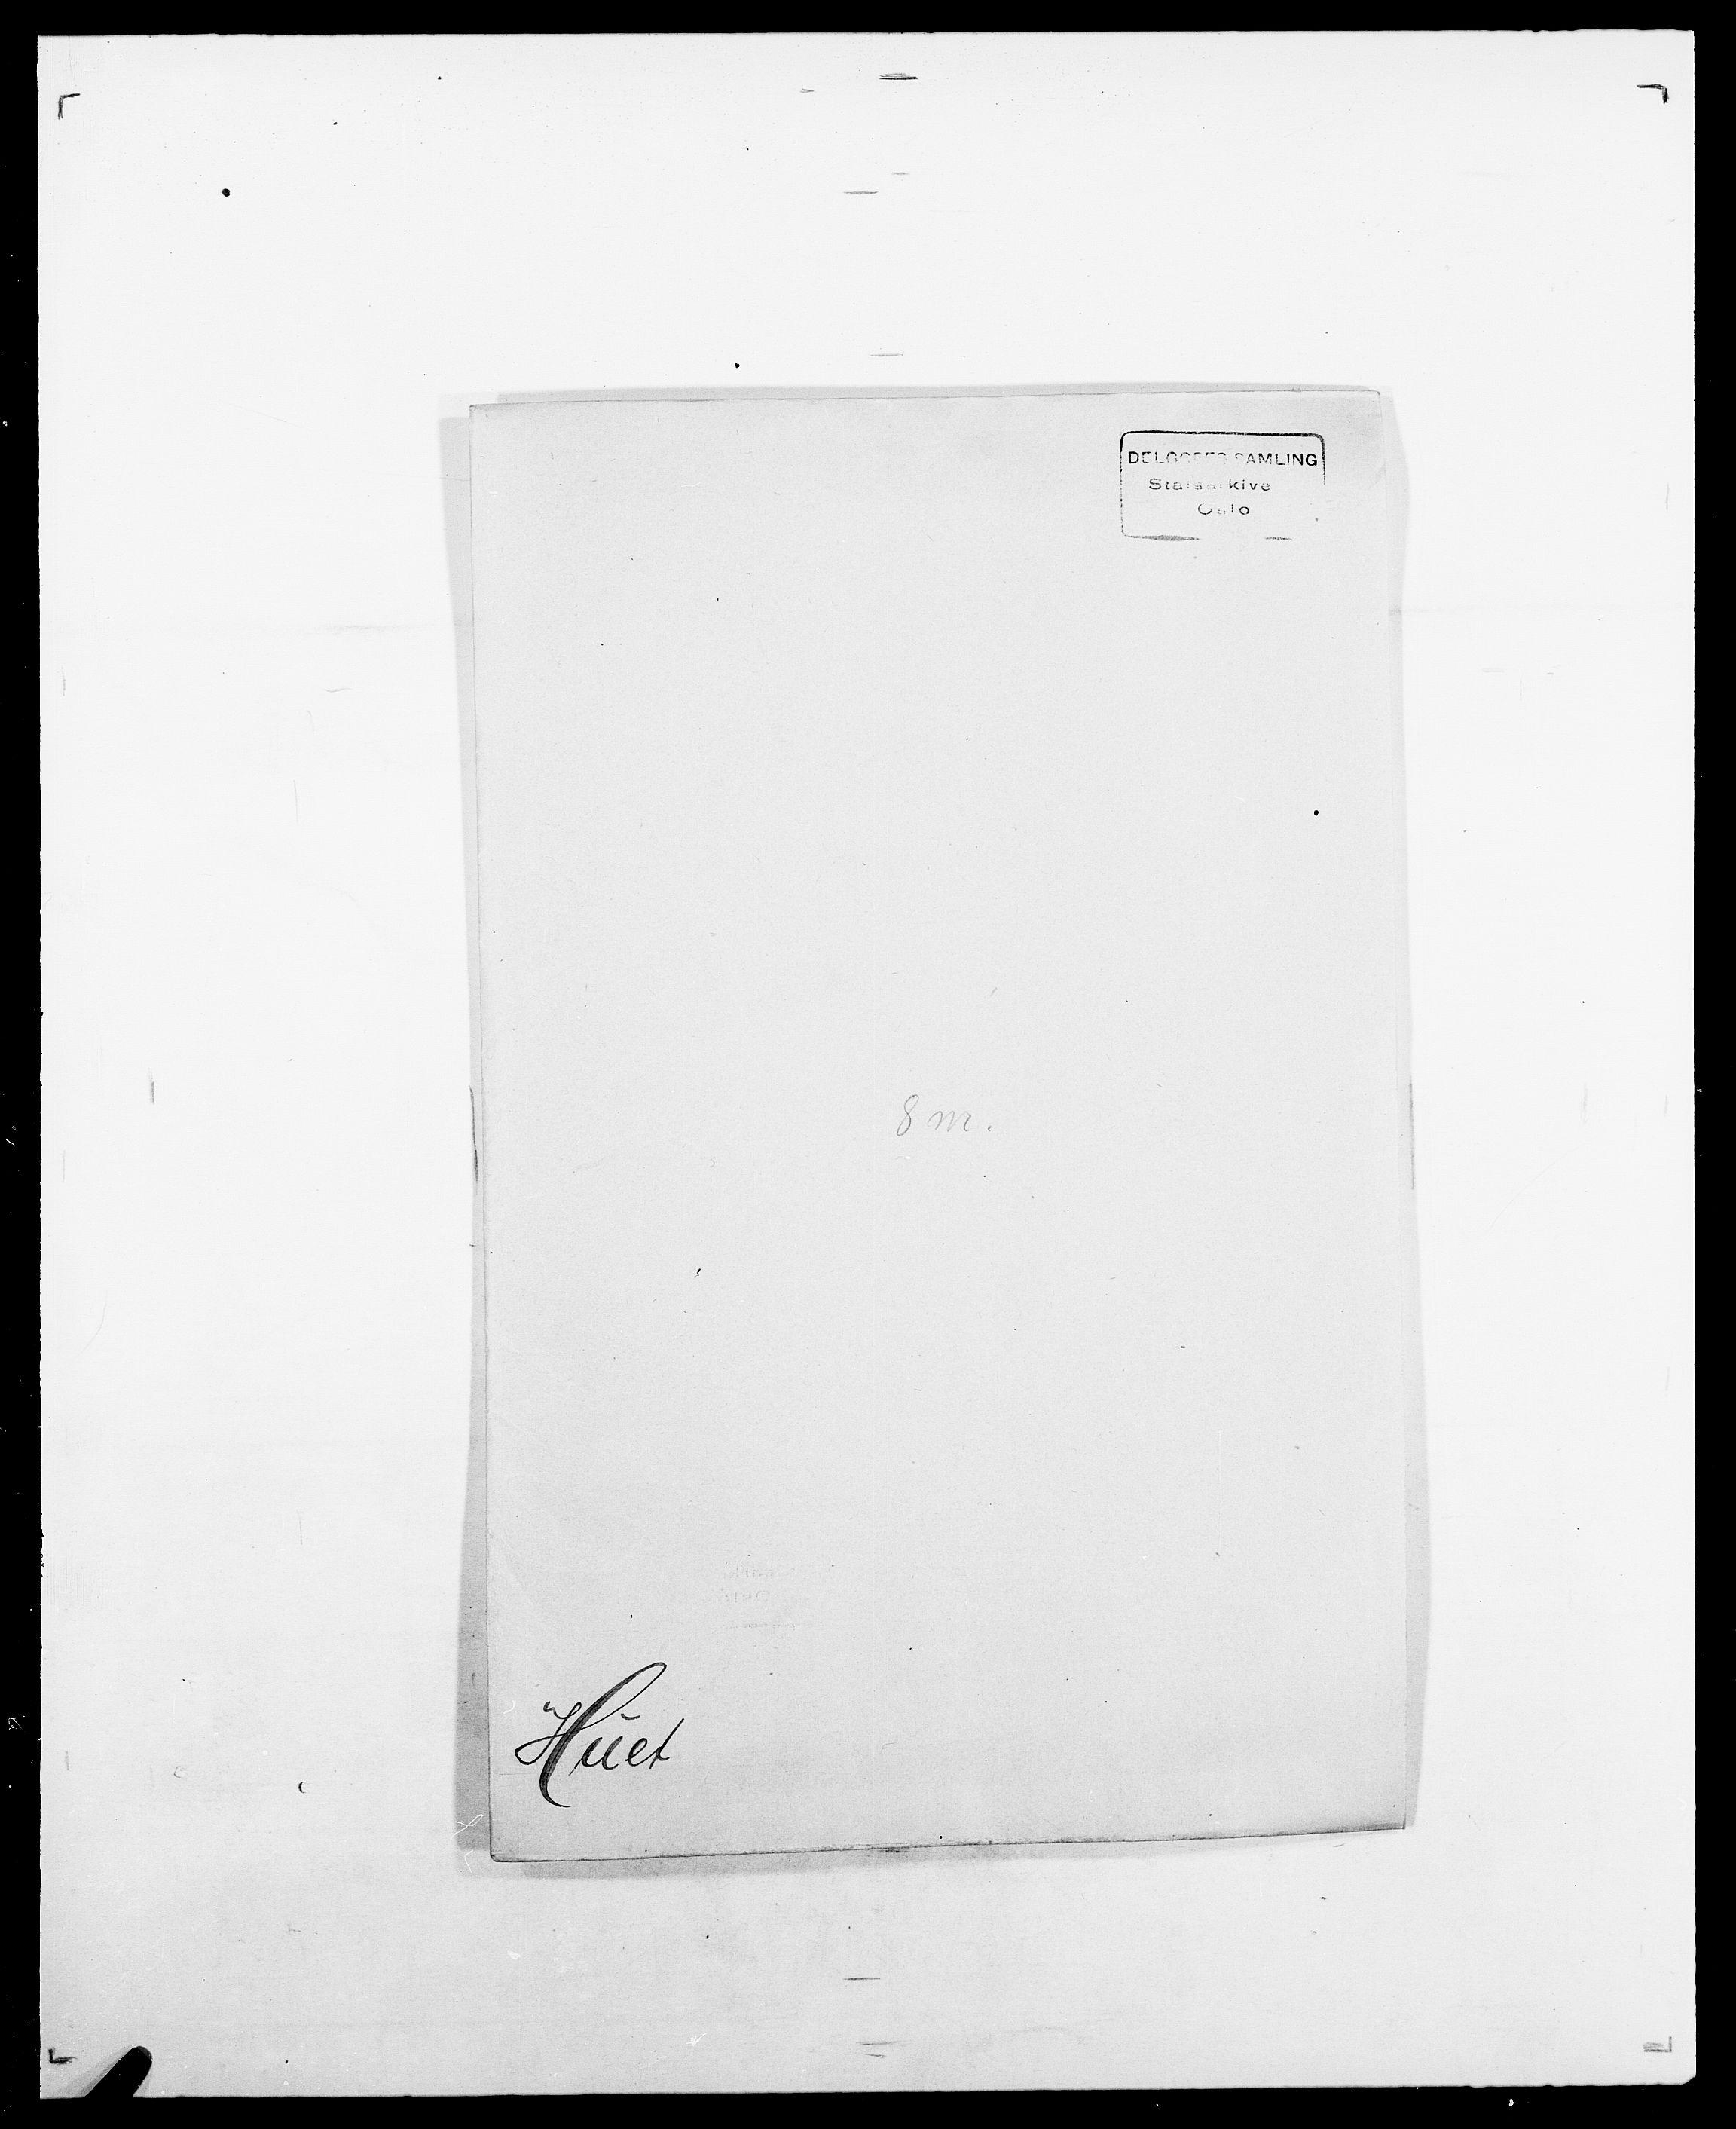 SAO, Delgobe, Charles Antoine - samling, D/Da/L0019: van der Hude - Joys, s. 5